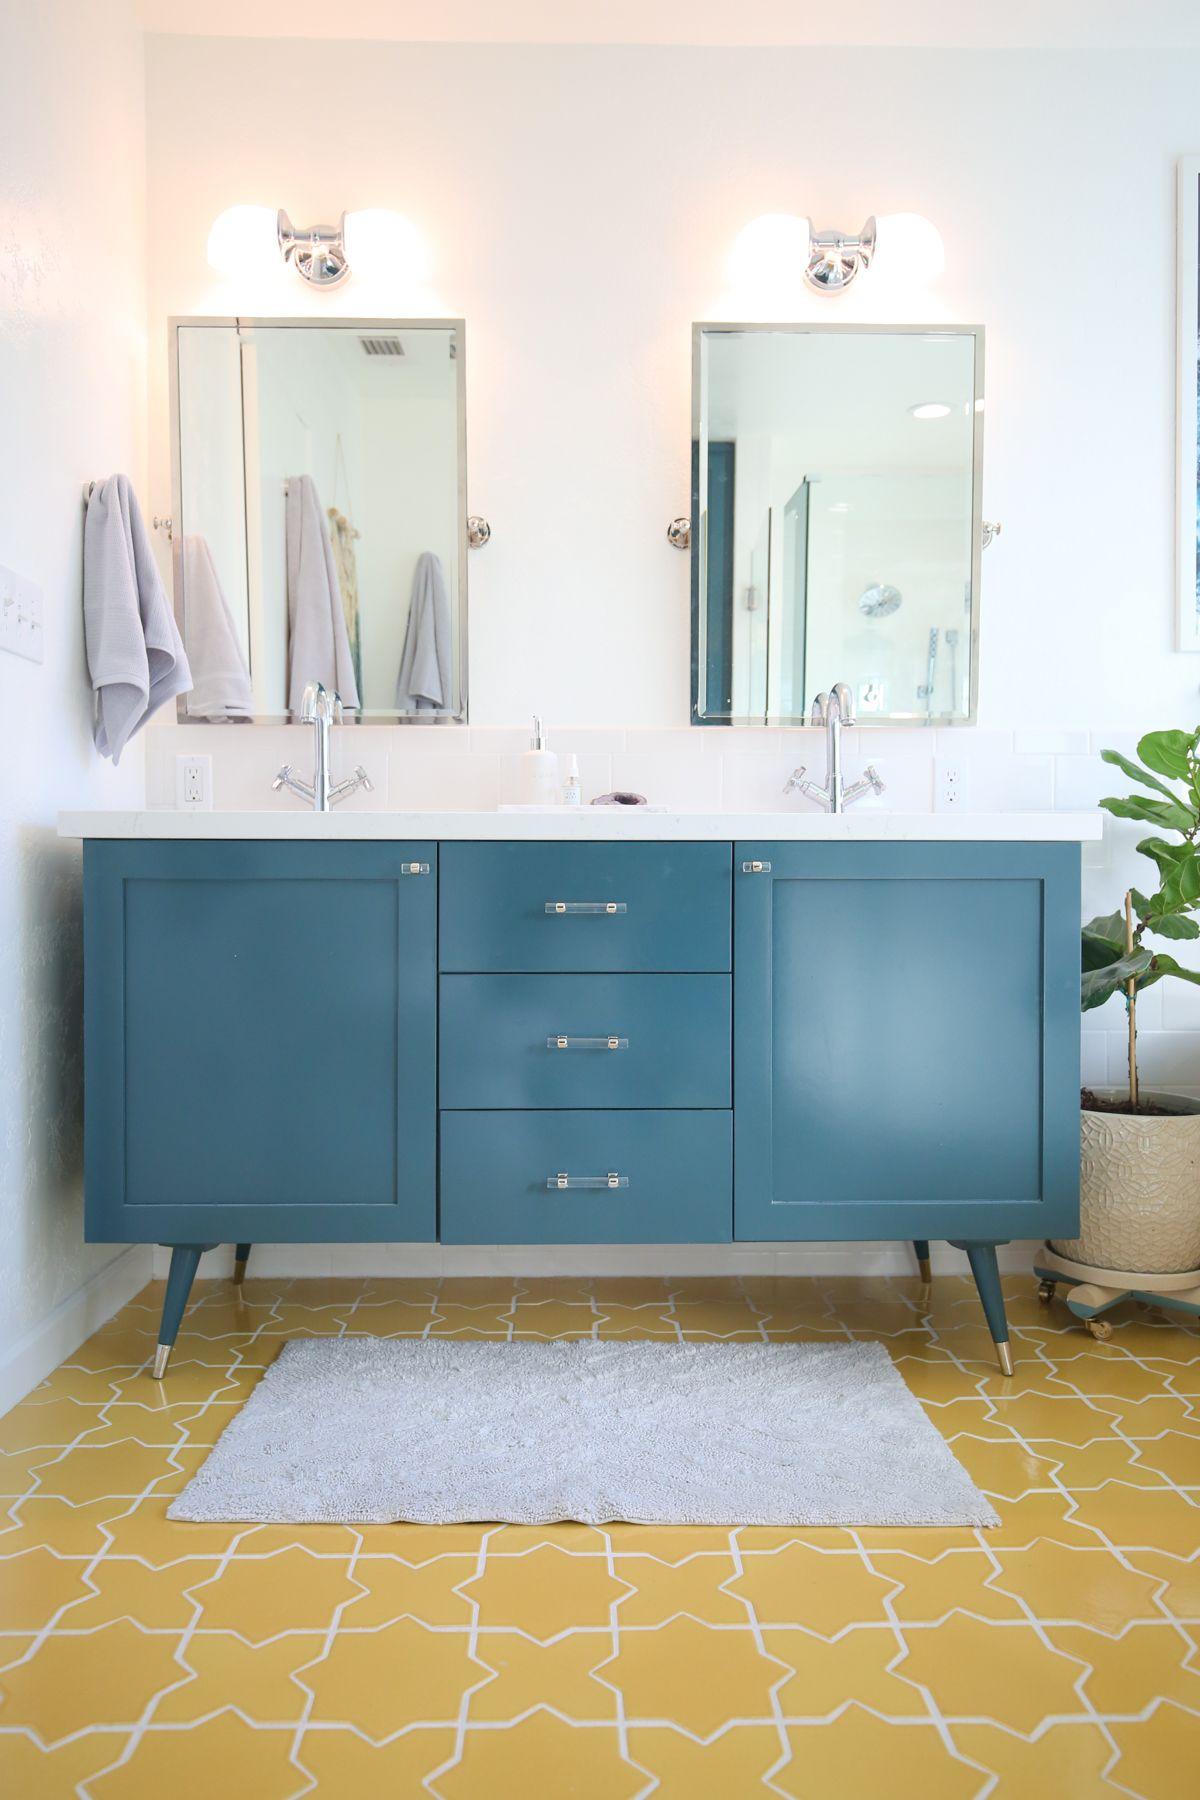 Room Reveal // New Master Bathroom   Pinterest   Master bathrooms ...